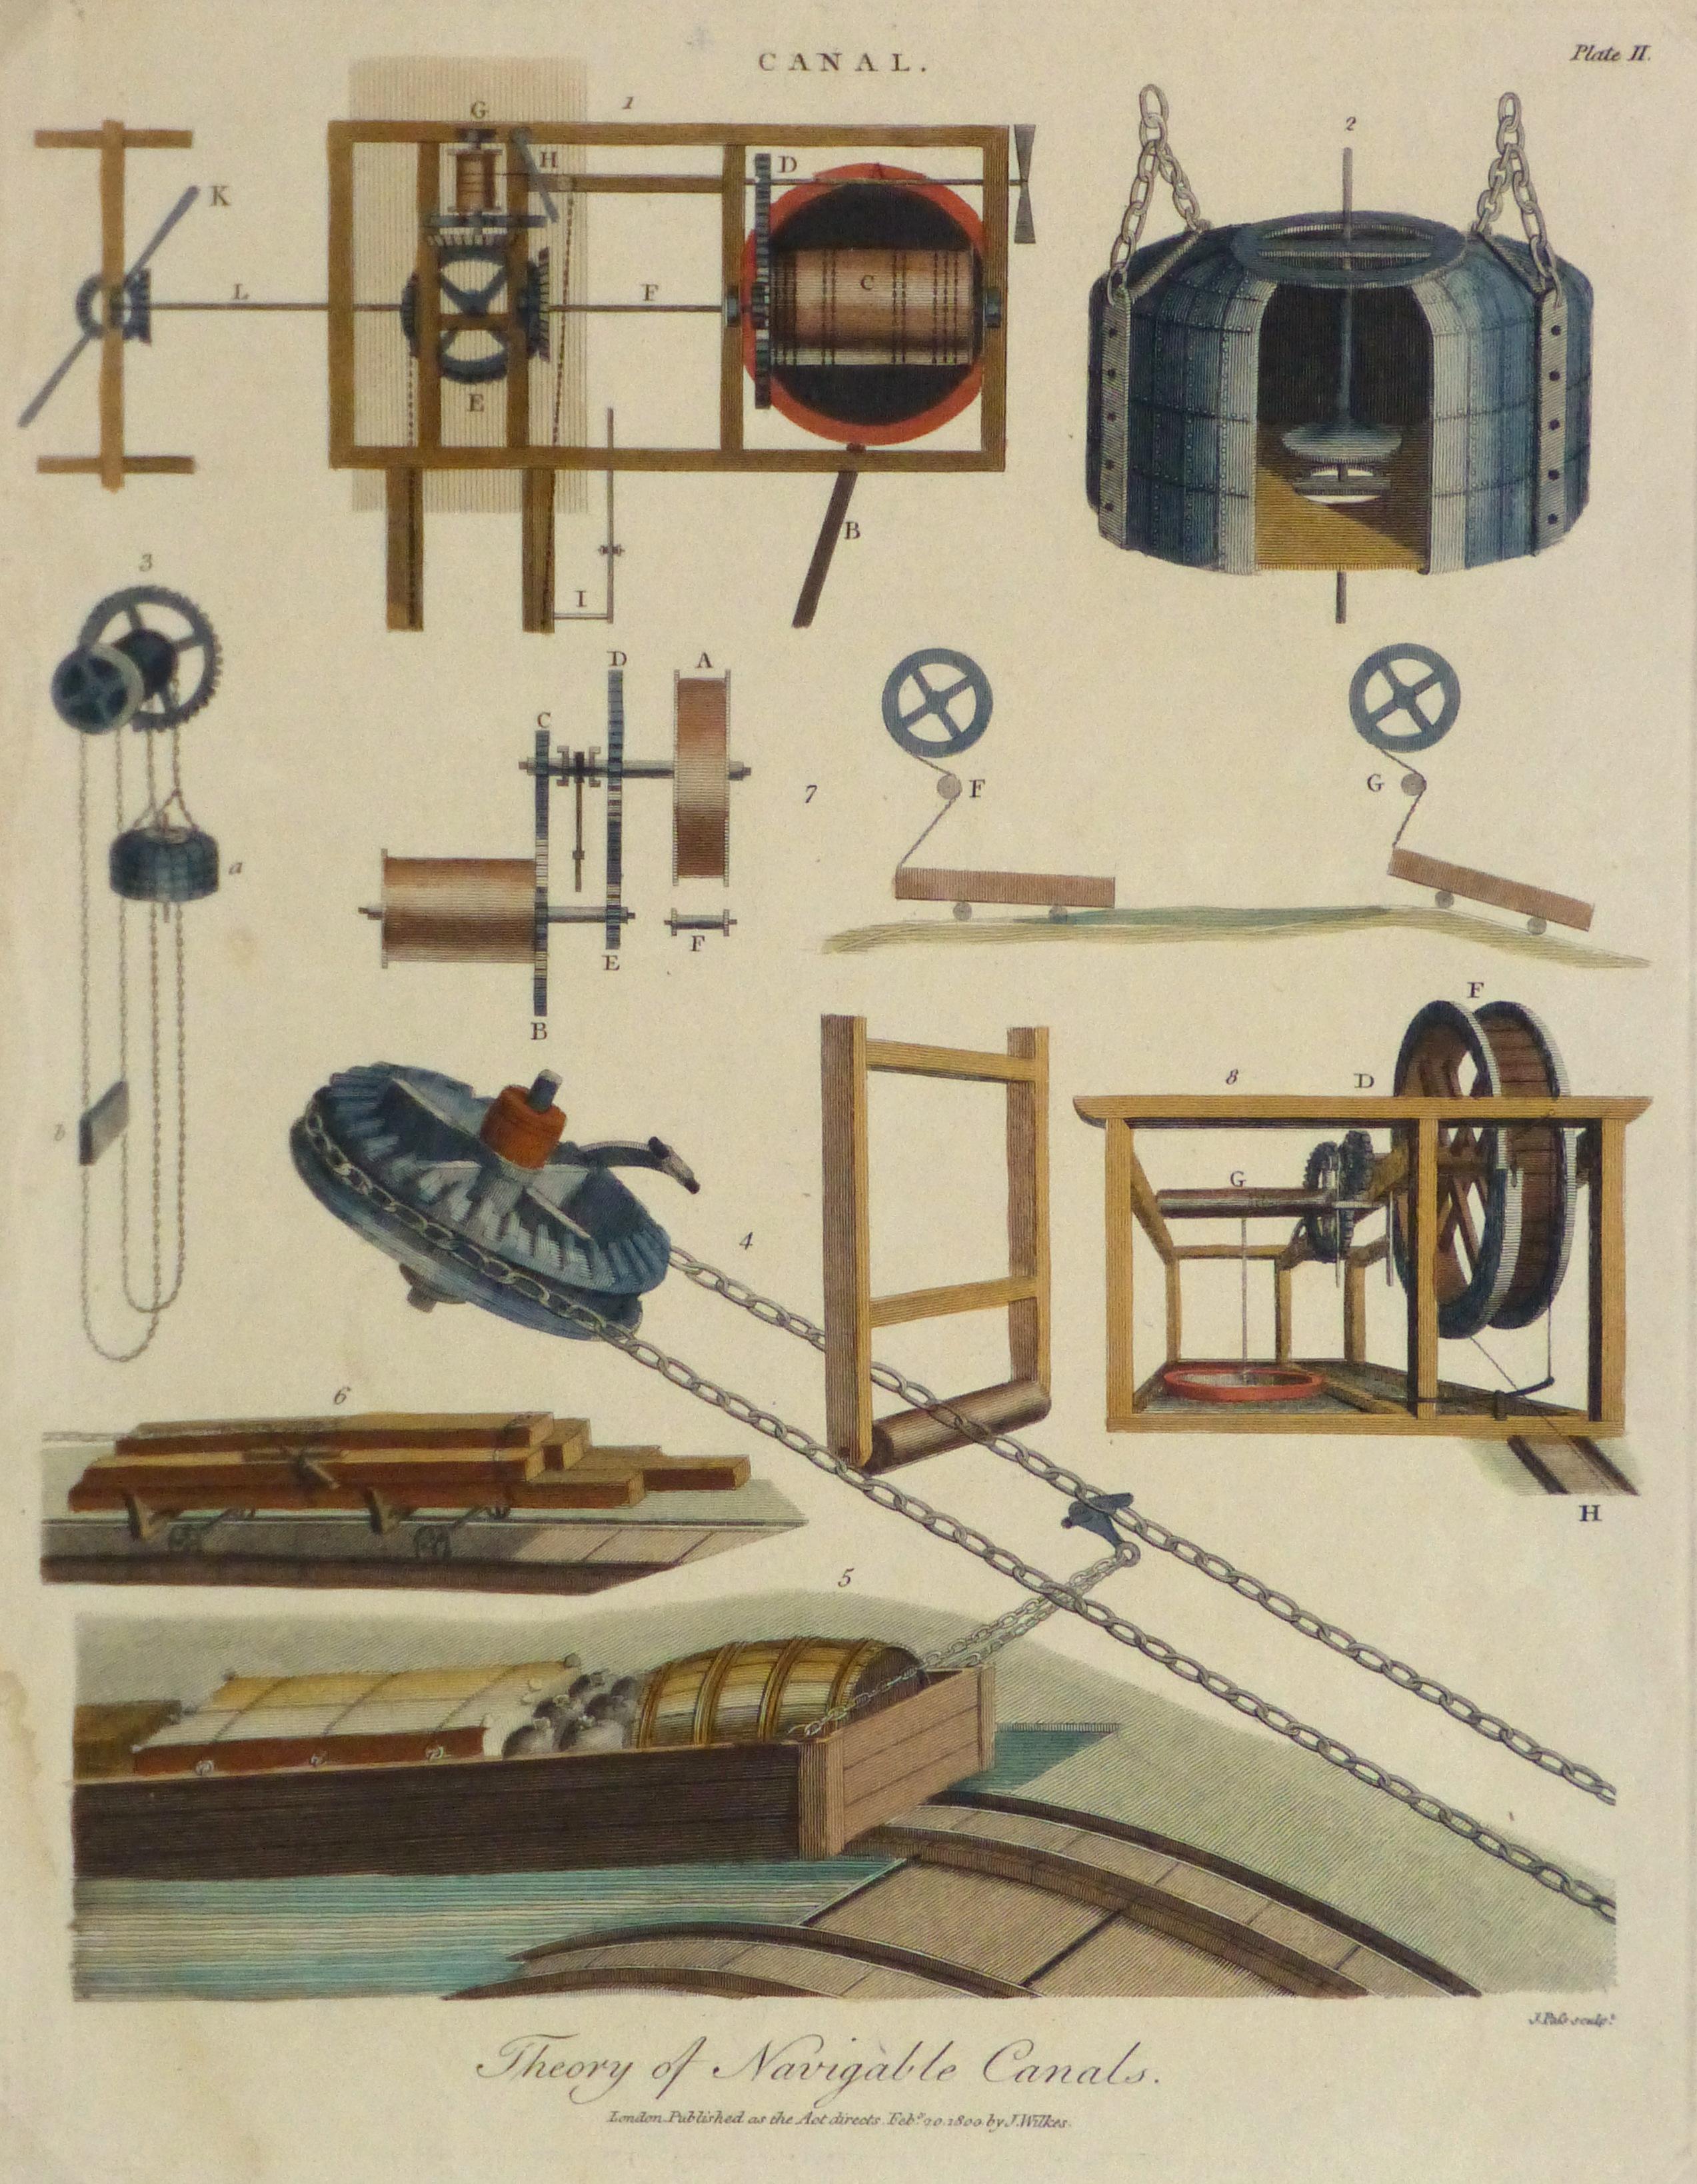 Canal Mechanics Engraving, 1800-main-10630M